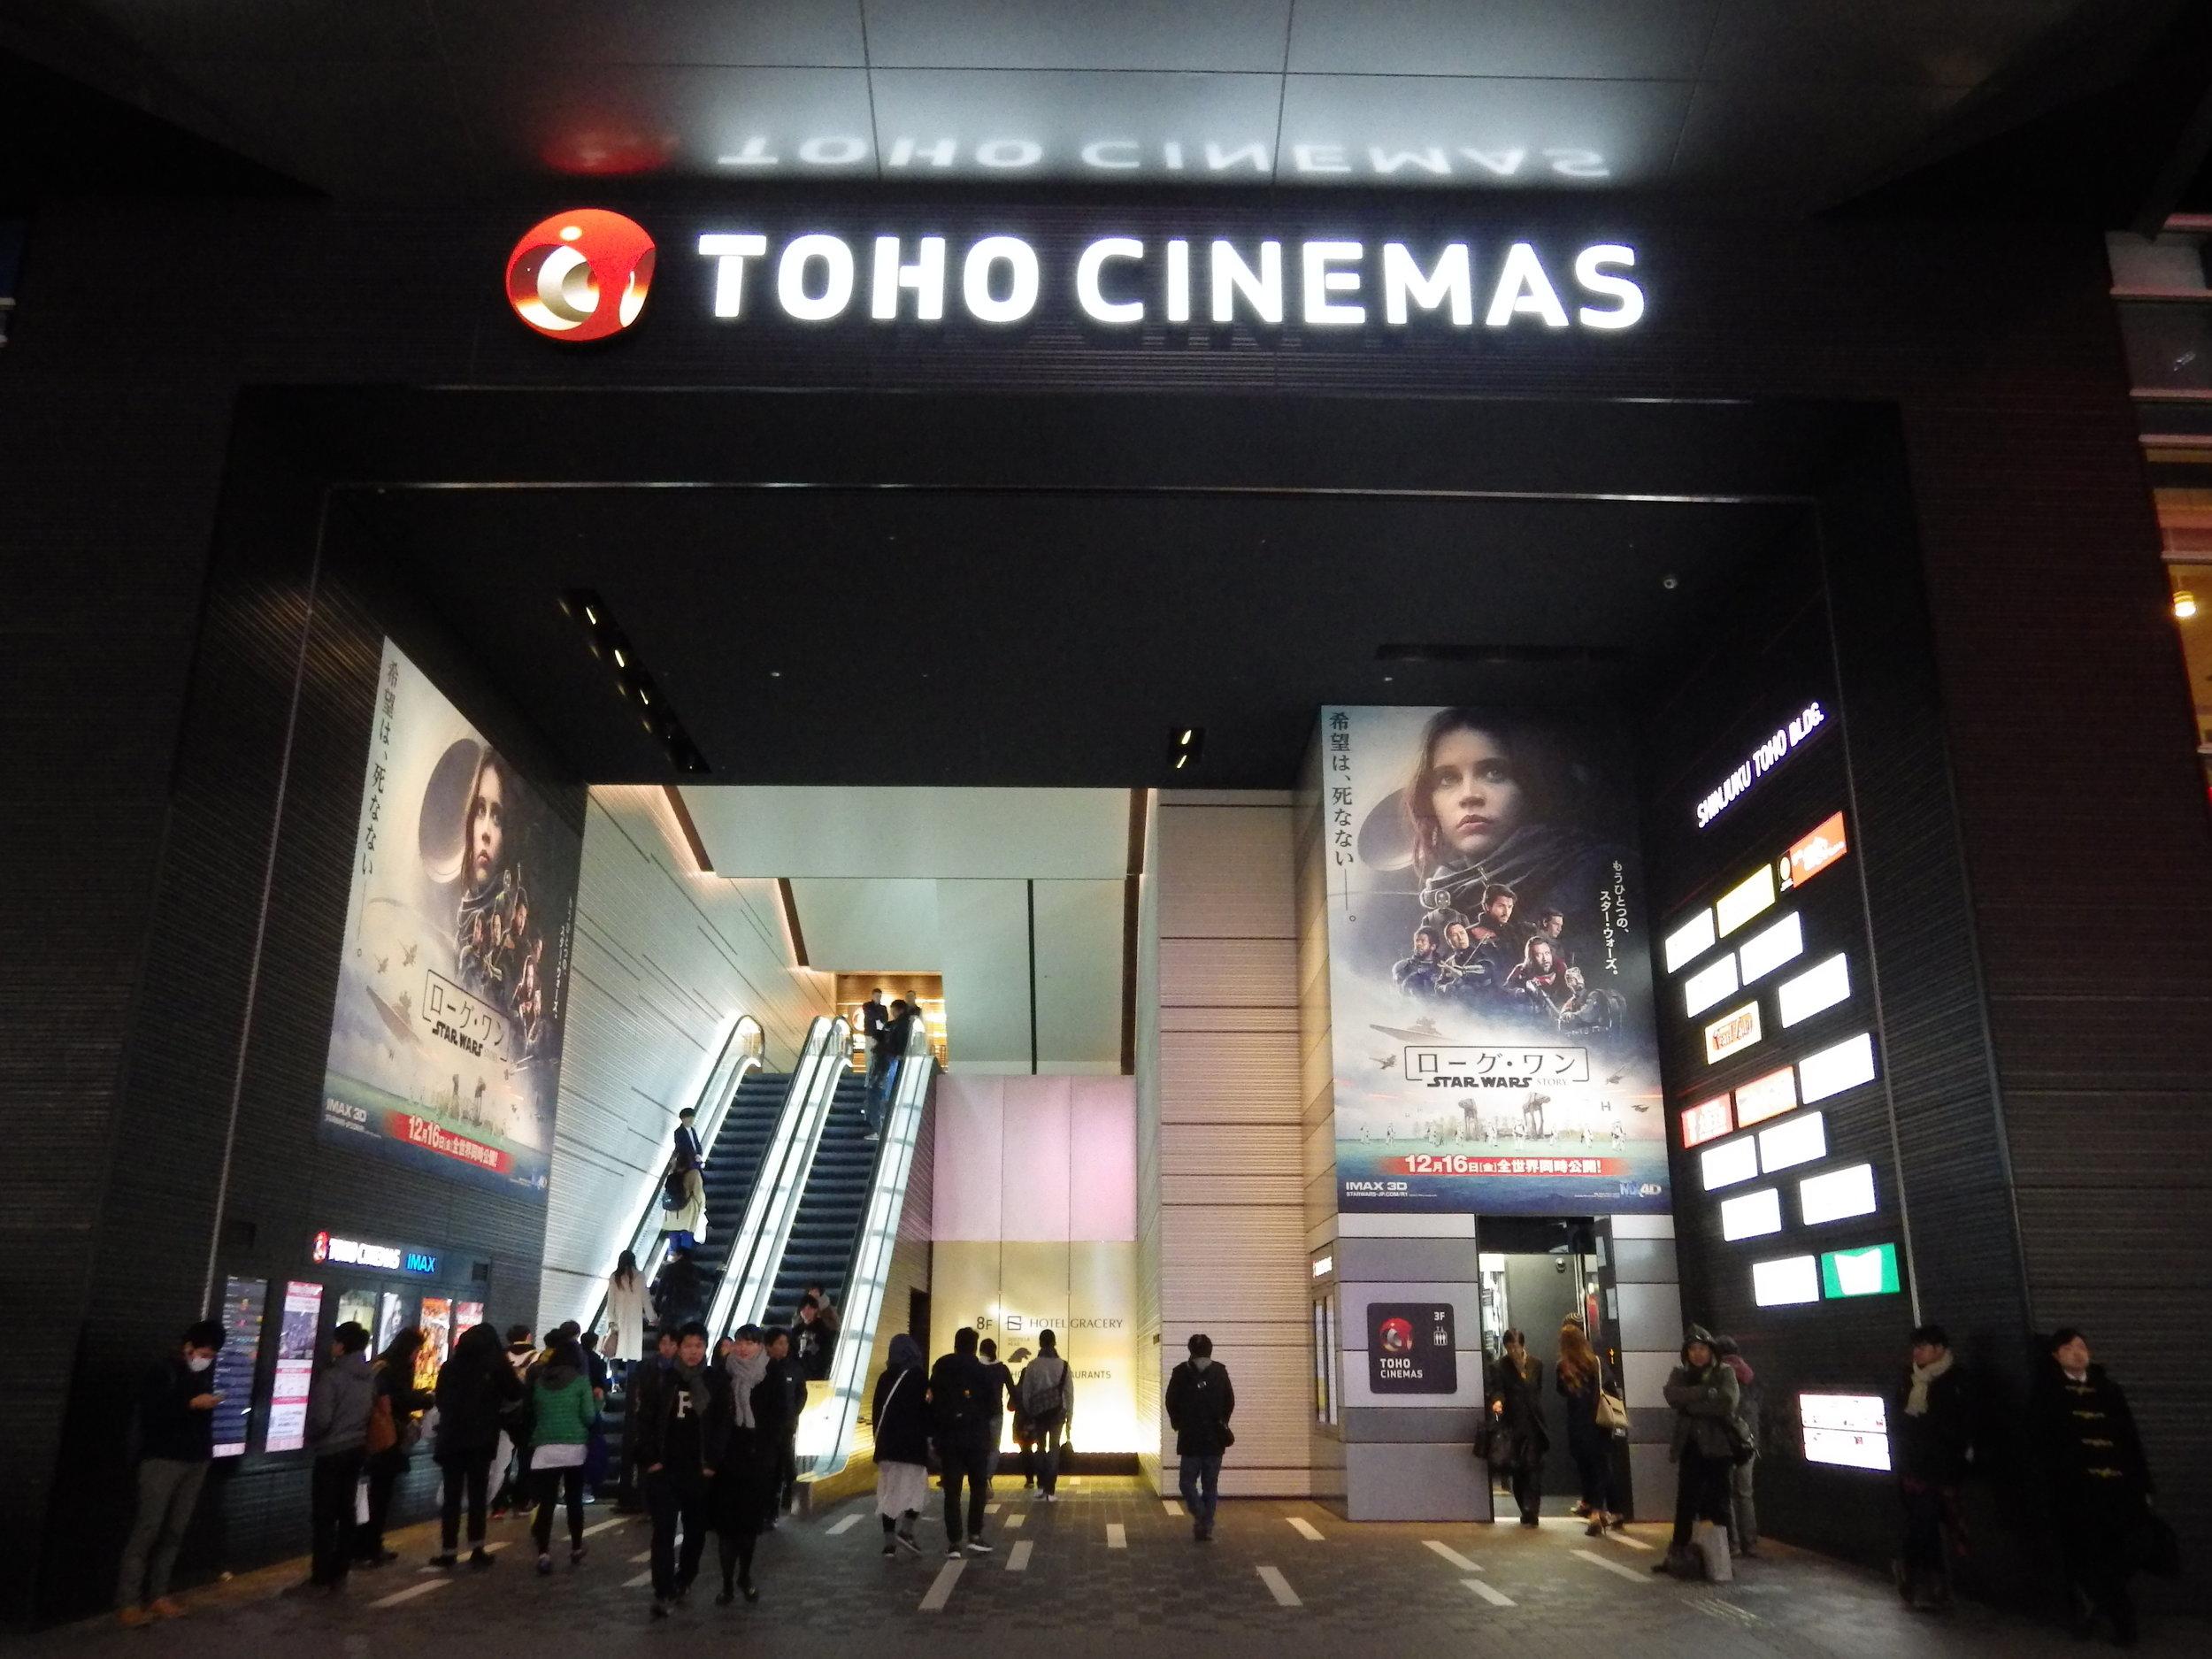 Large-scale  Rogue One banners at the entrance to Toho Cinemas Shinjuku in   Kabukicho,  Tokyo.